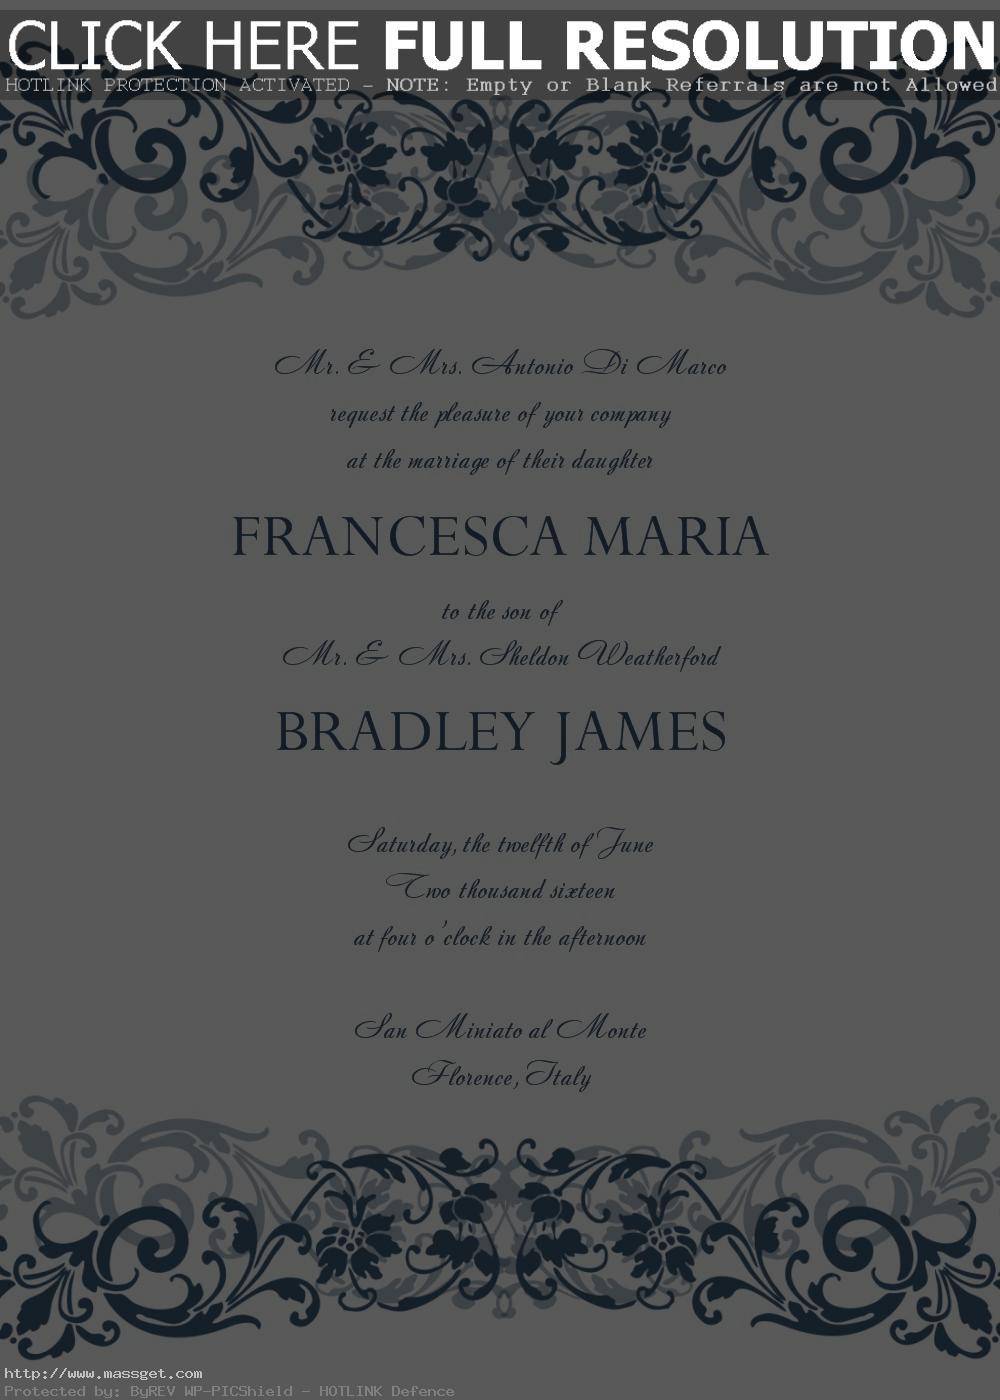 Silver Wedding Invitations: free wedding invitation templates